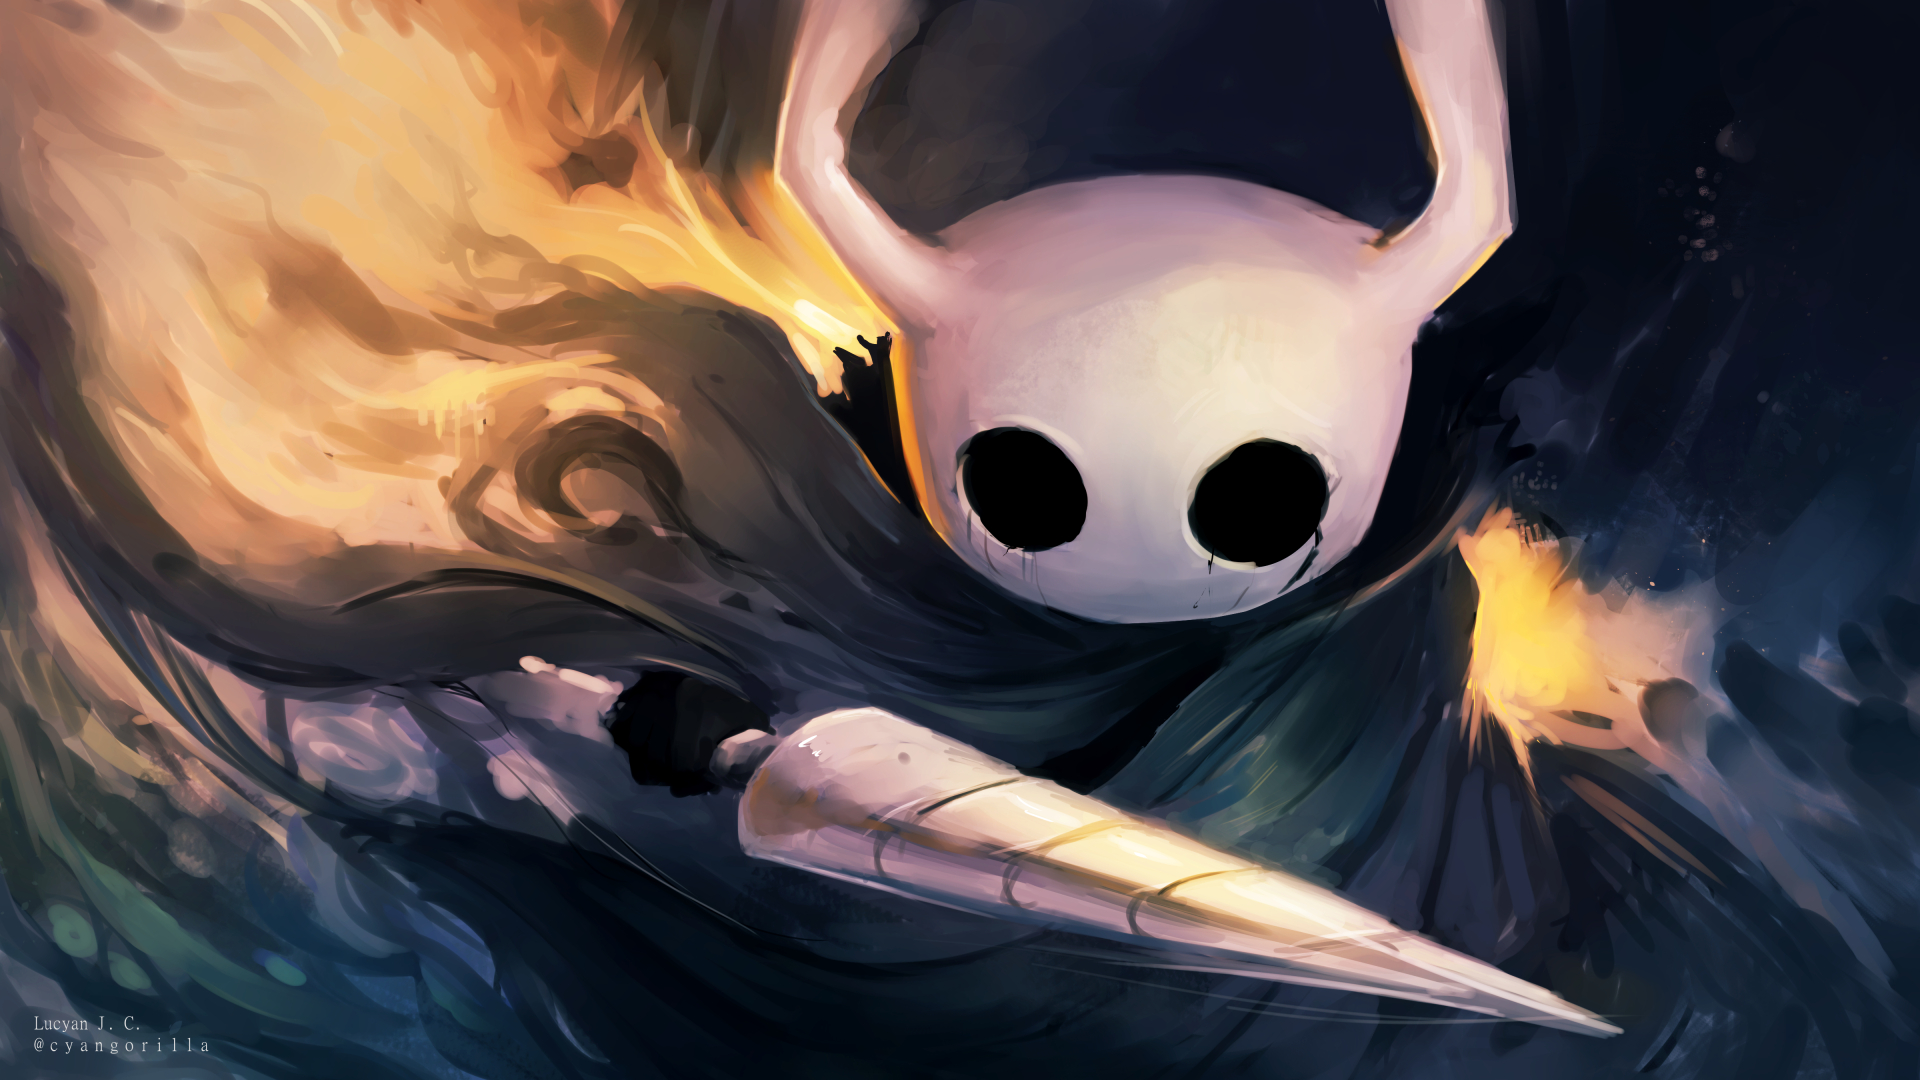 QP05 - Hollow Knight